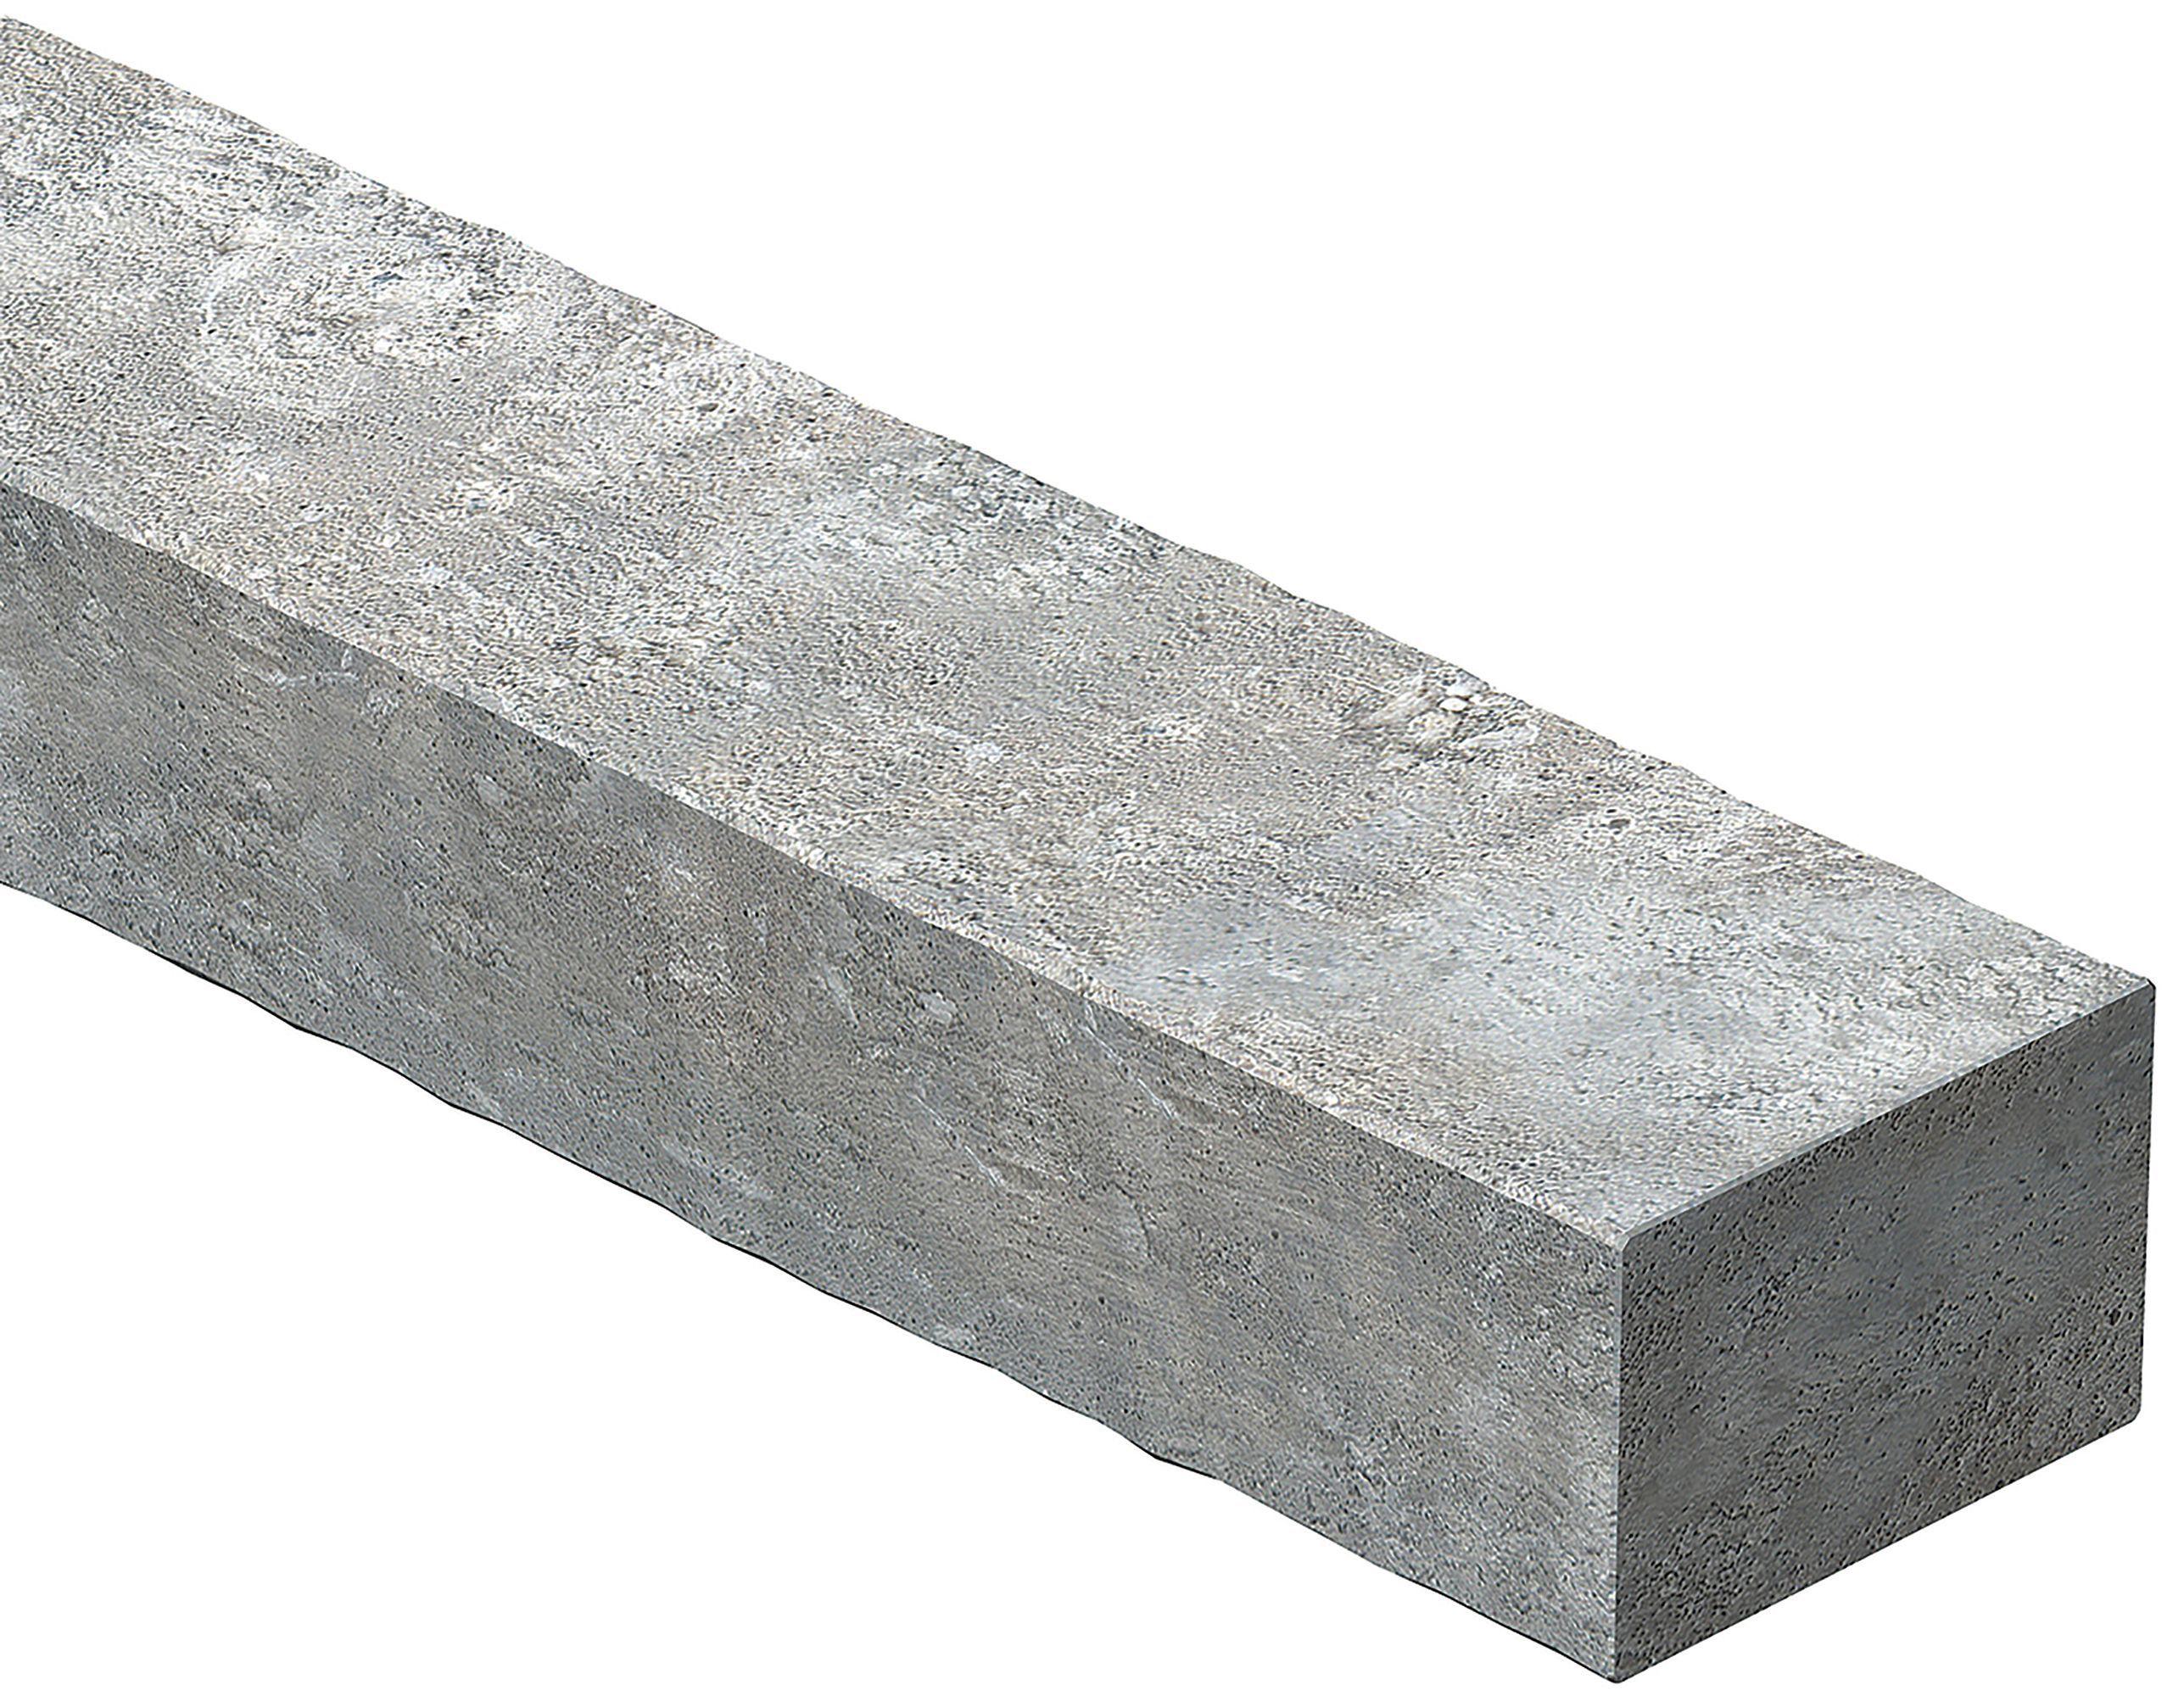 Expamet Pre Stressed Reinforced Concrete Lintel L 600mm